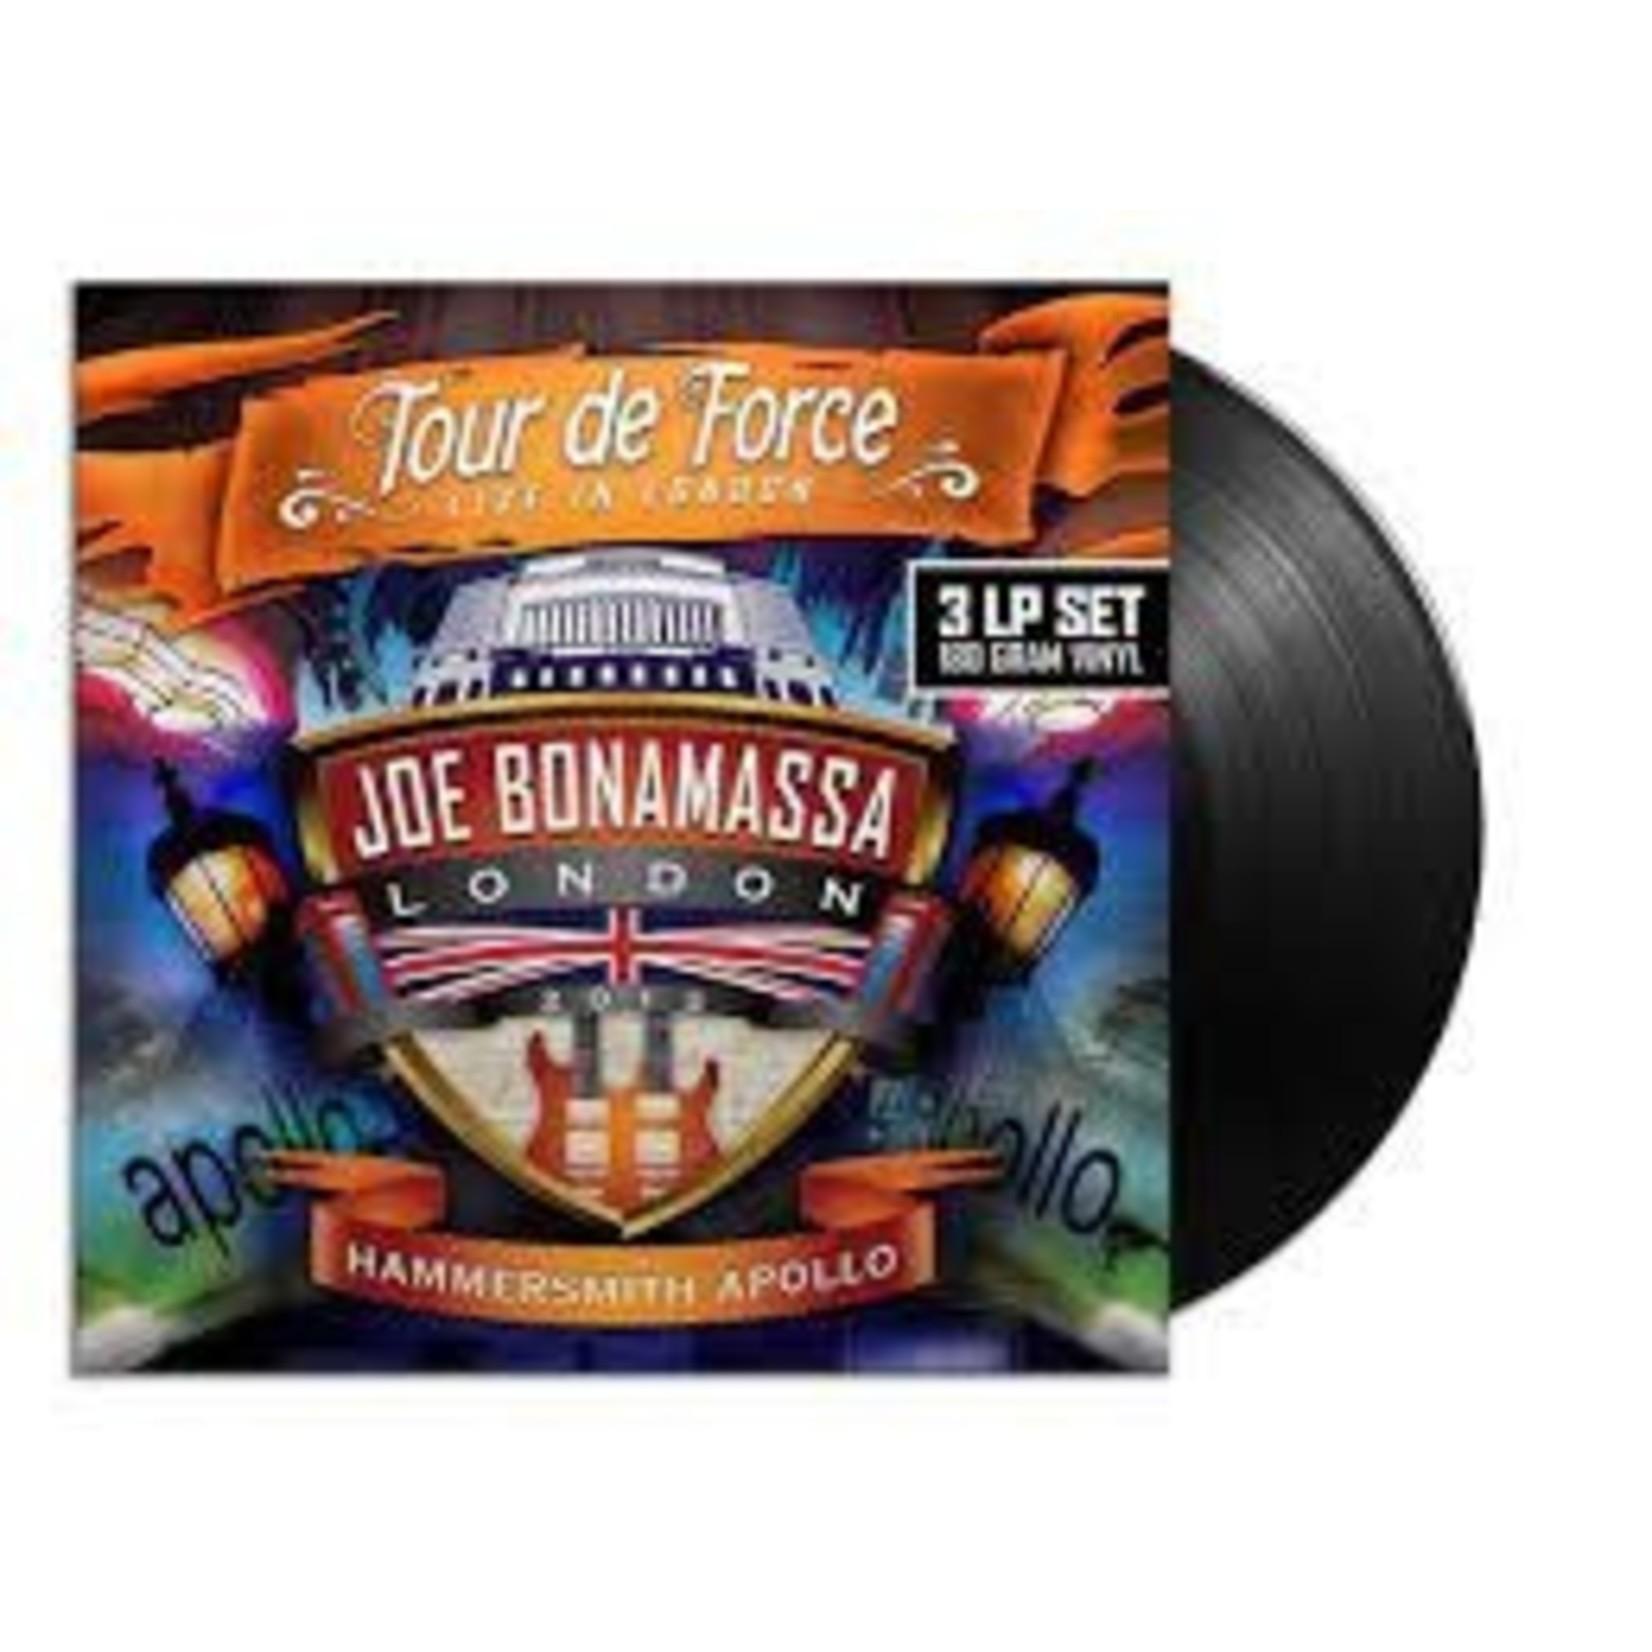 JOE BONAMASSA - TOUR DE FORCE - lIVE IN LONDON AT HAMMERSMITH APOLLO 3LP (VINYL)